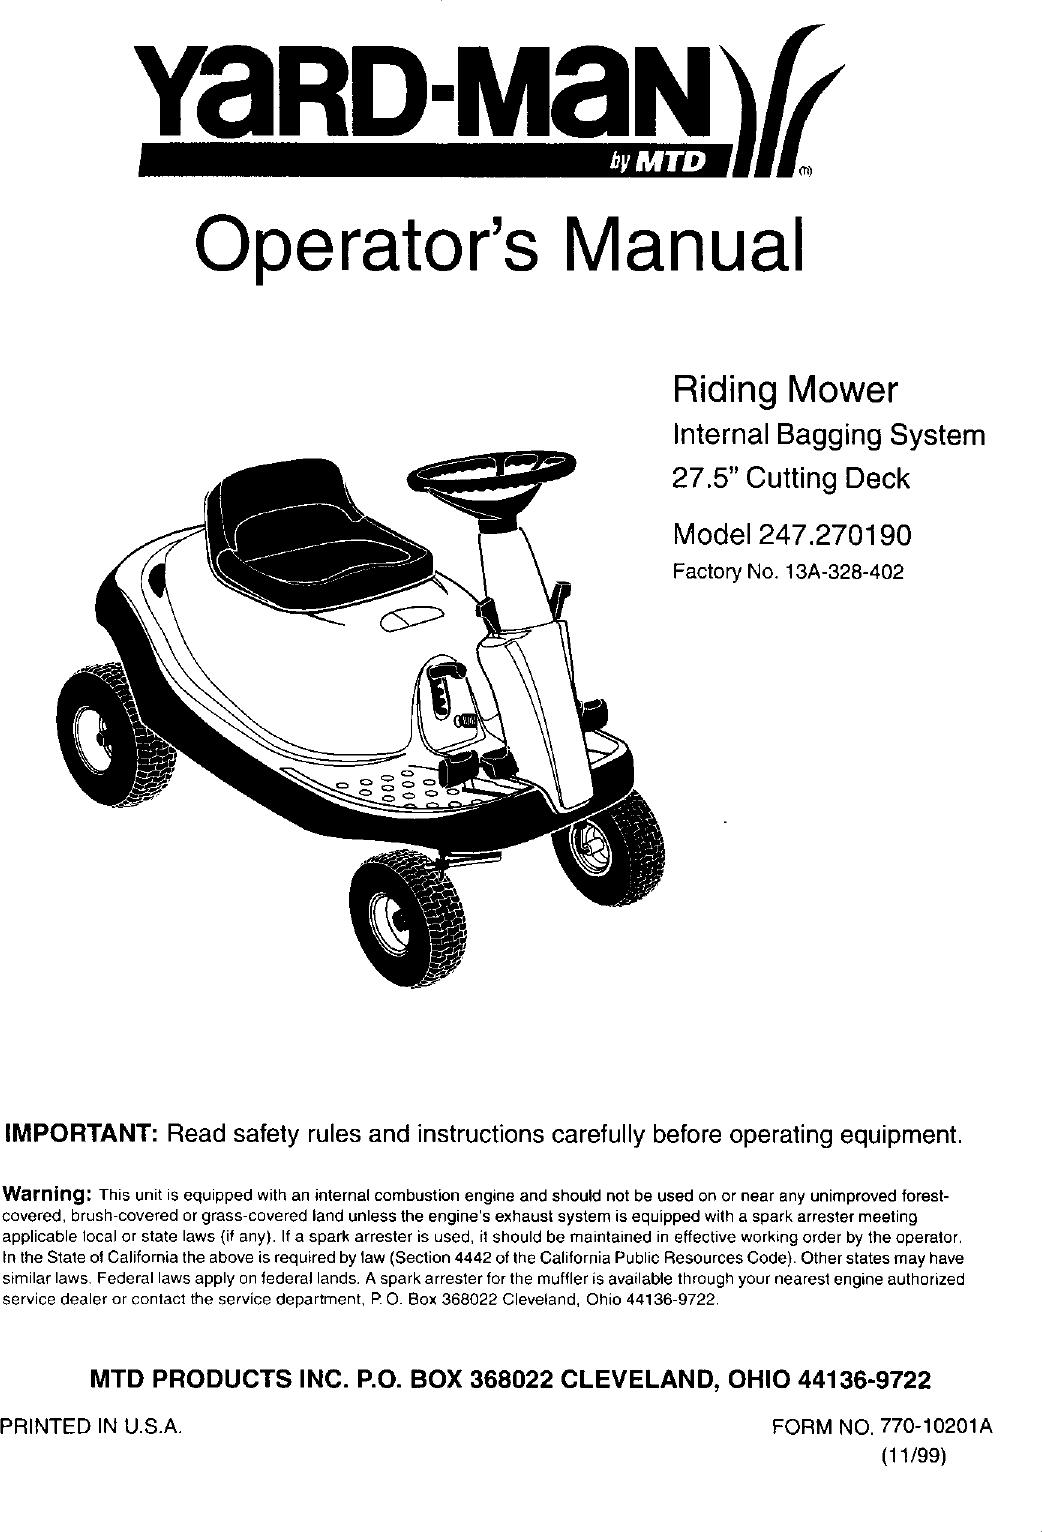 Craftsman Riding Lawn Mower Deck V Manual Guide